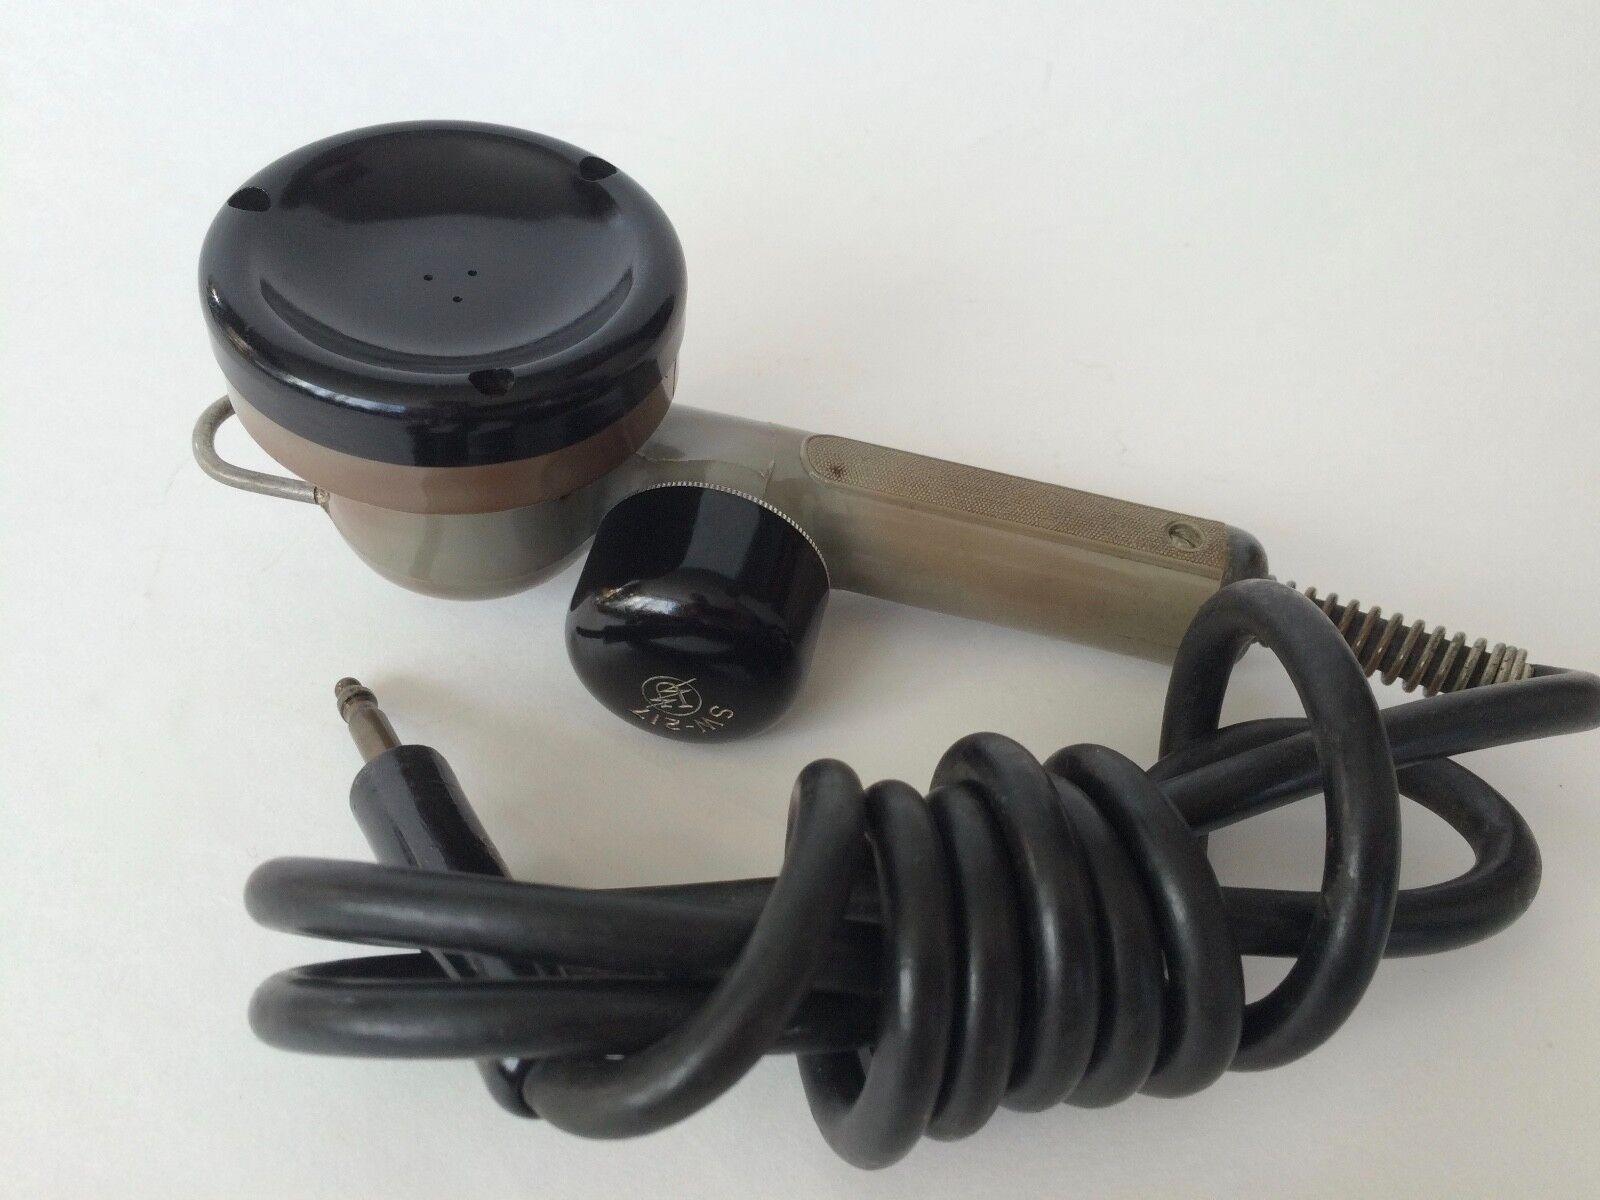 Signal Corps Military Era Vintage Microphone RCA EV Altec WE Movie Prop